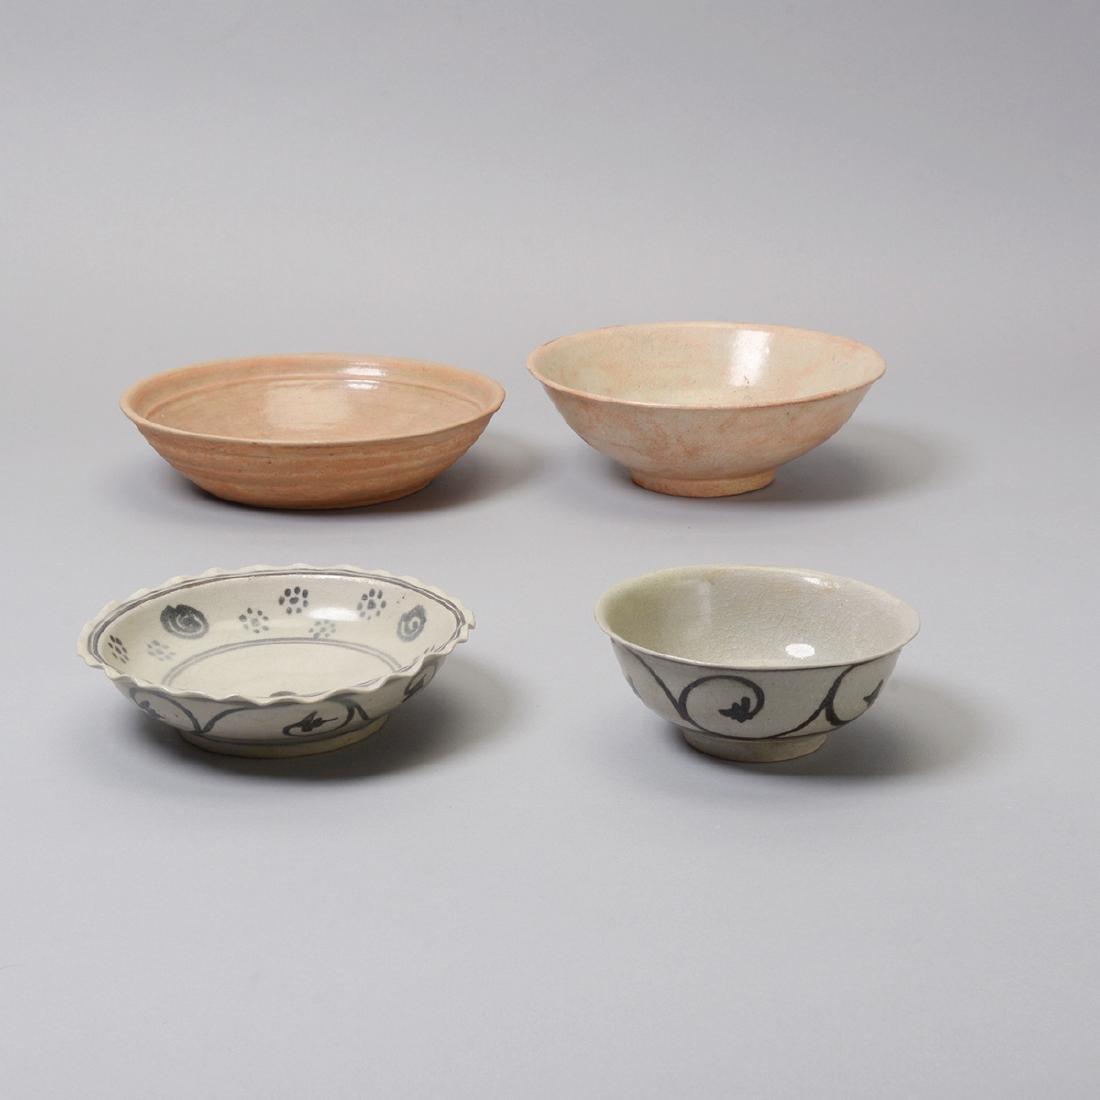 Large Group of Thai Glazed Ceramics, 7th - 16th C - 3